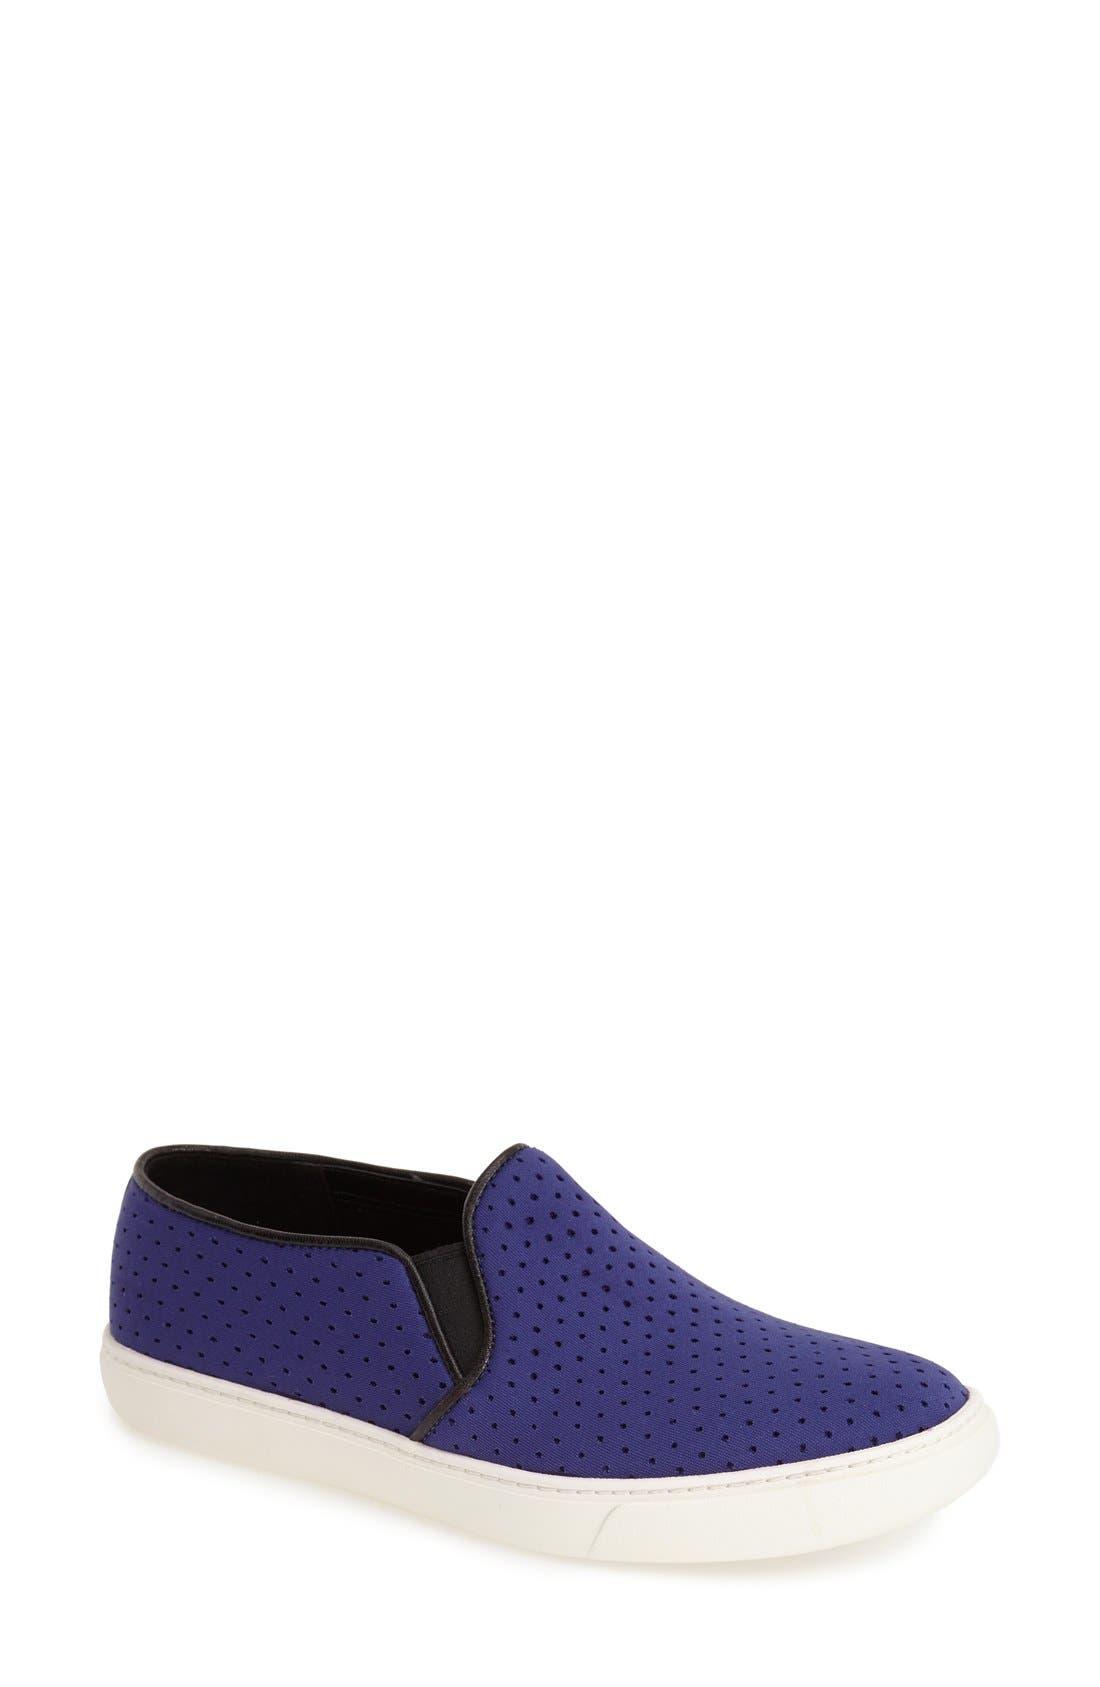 Alternate Image 1 Selected - Cole Haan 'Bowie' Slip-On Sneaker (Women)